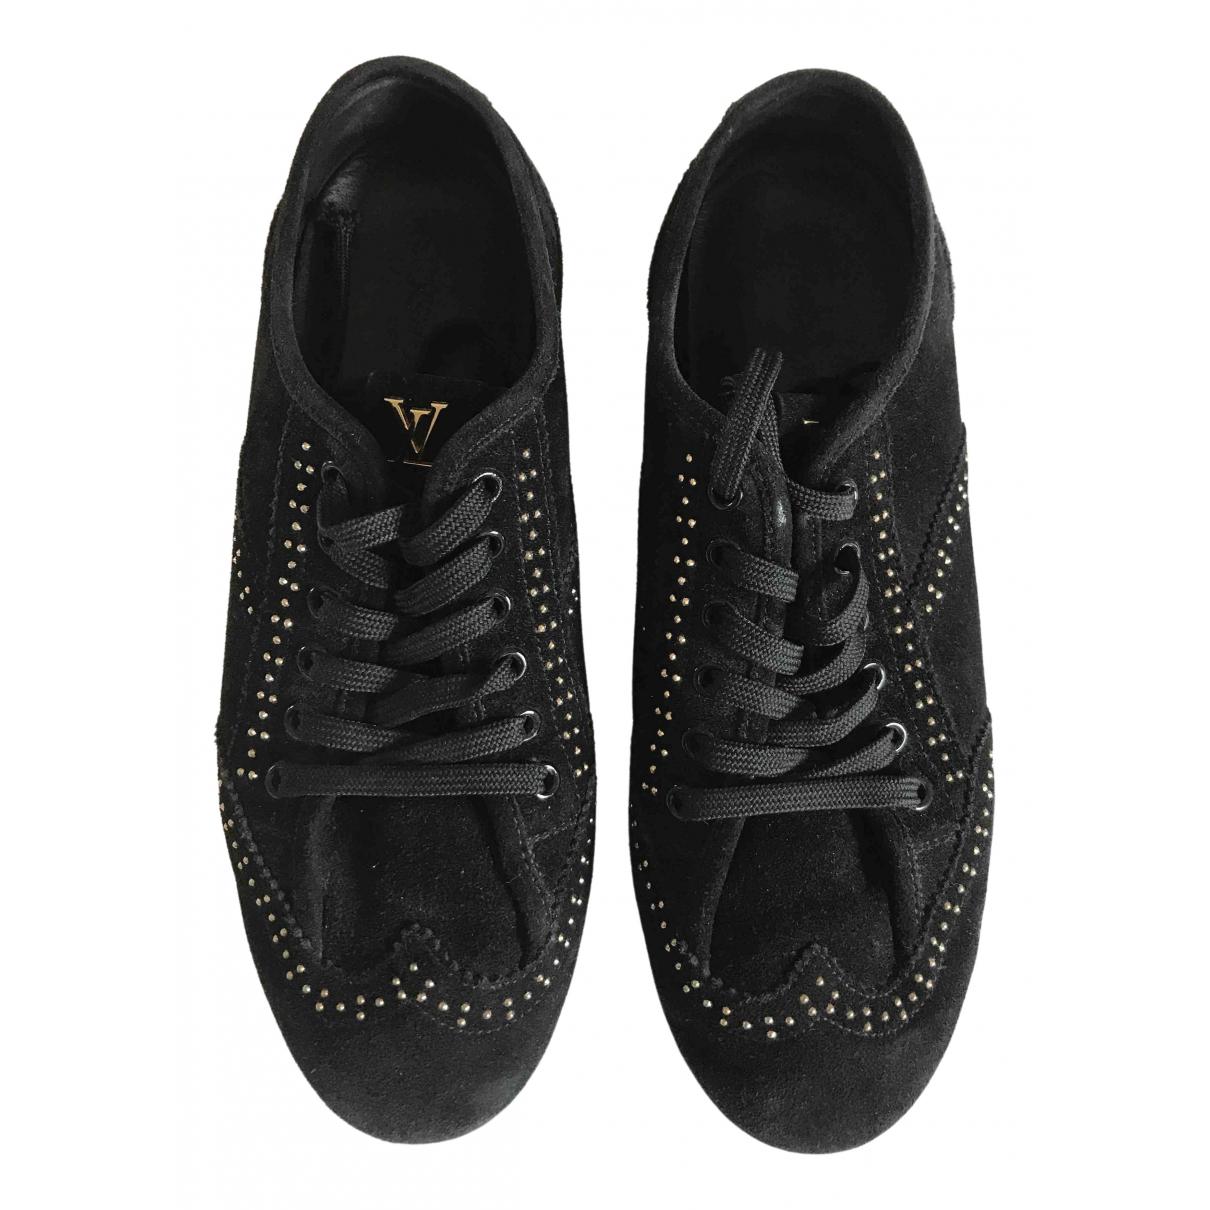 Louis Vuitton \N Black Suede Trainers for Women 36.5 EU